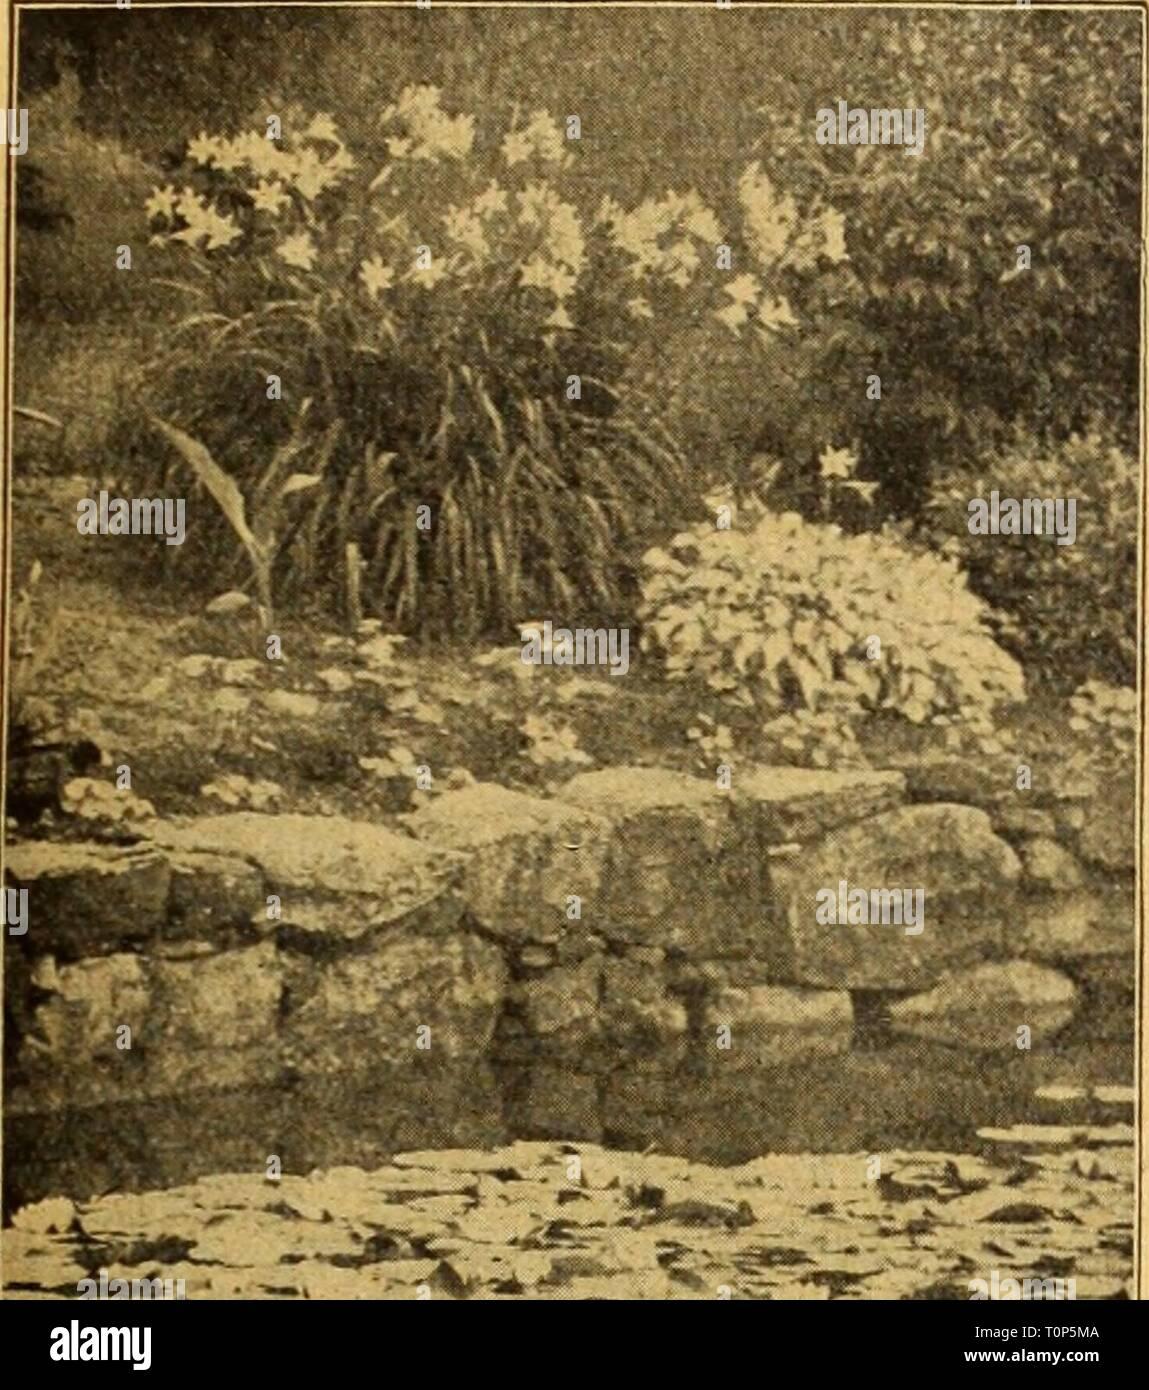 Dreer's autumn catalogue 1926 (1926) Dreer's autumn catalogue 1926